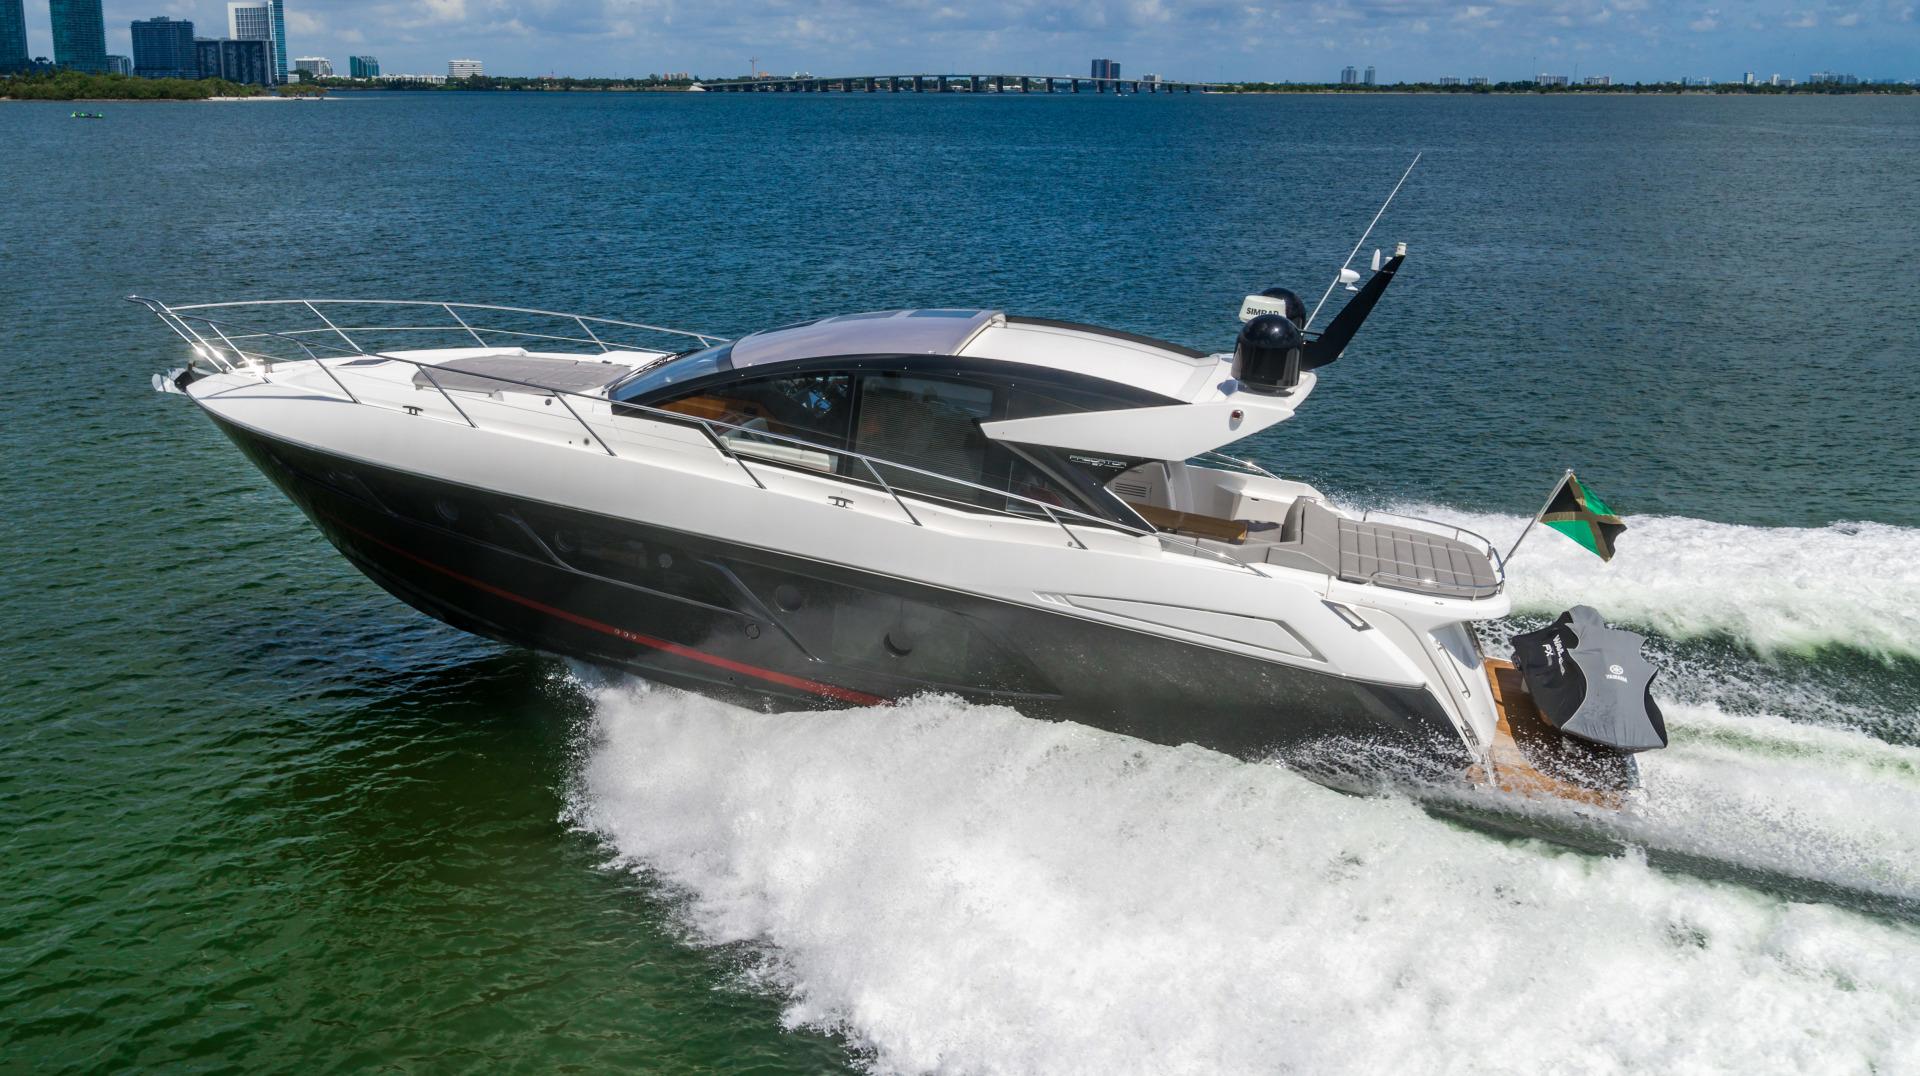 Sunseeker-Predator 2019 -Miami Beach-Florida-United States-1475700 | Thumbnail